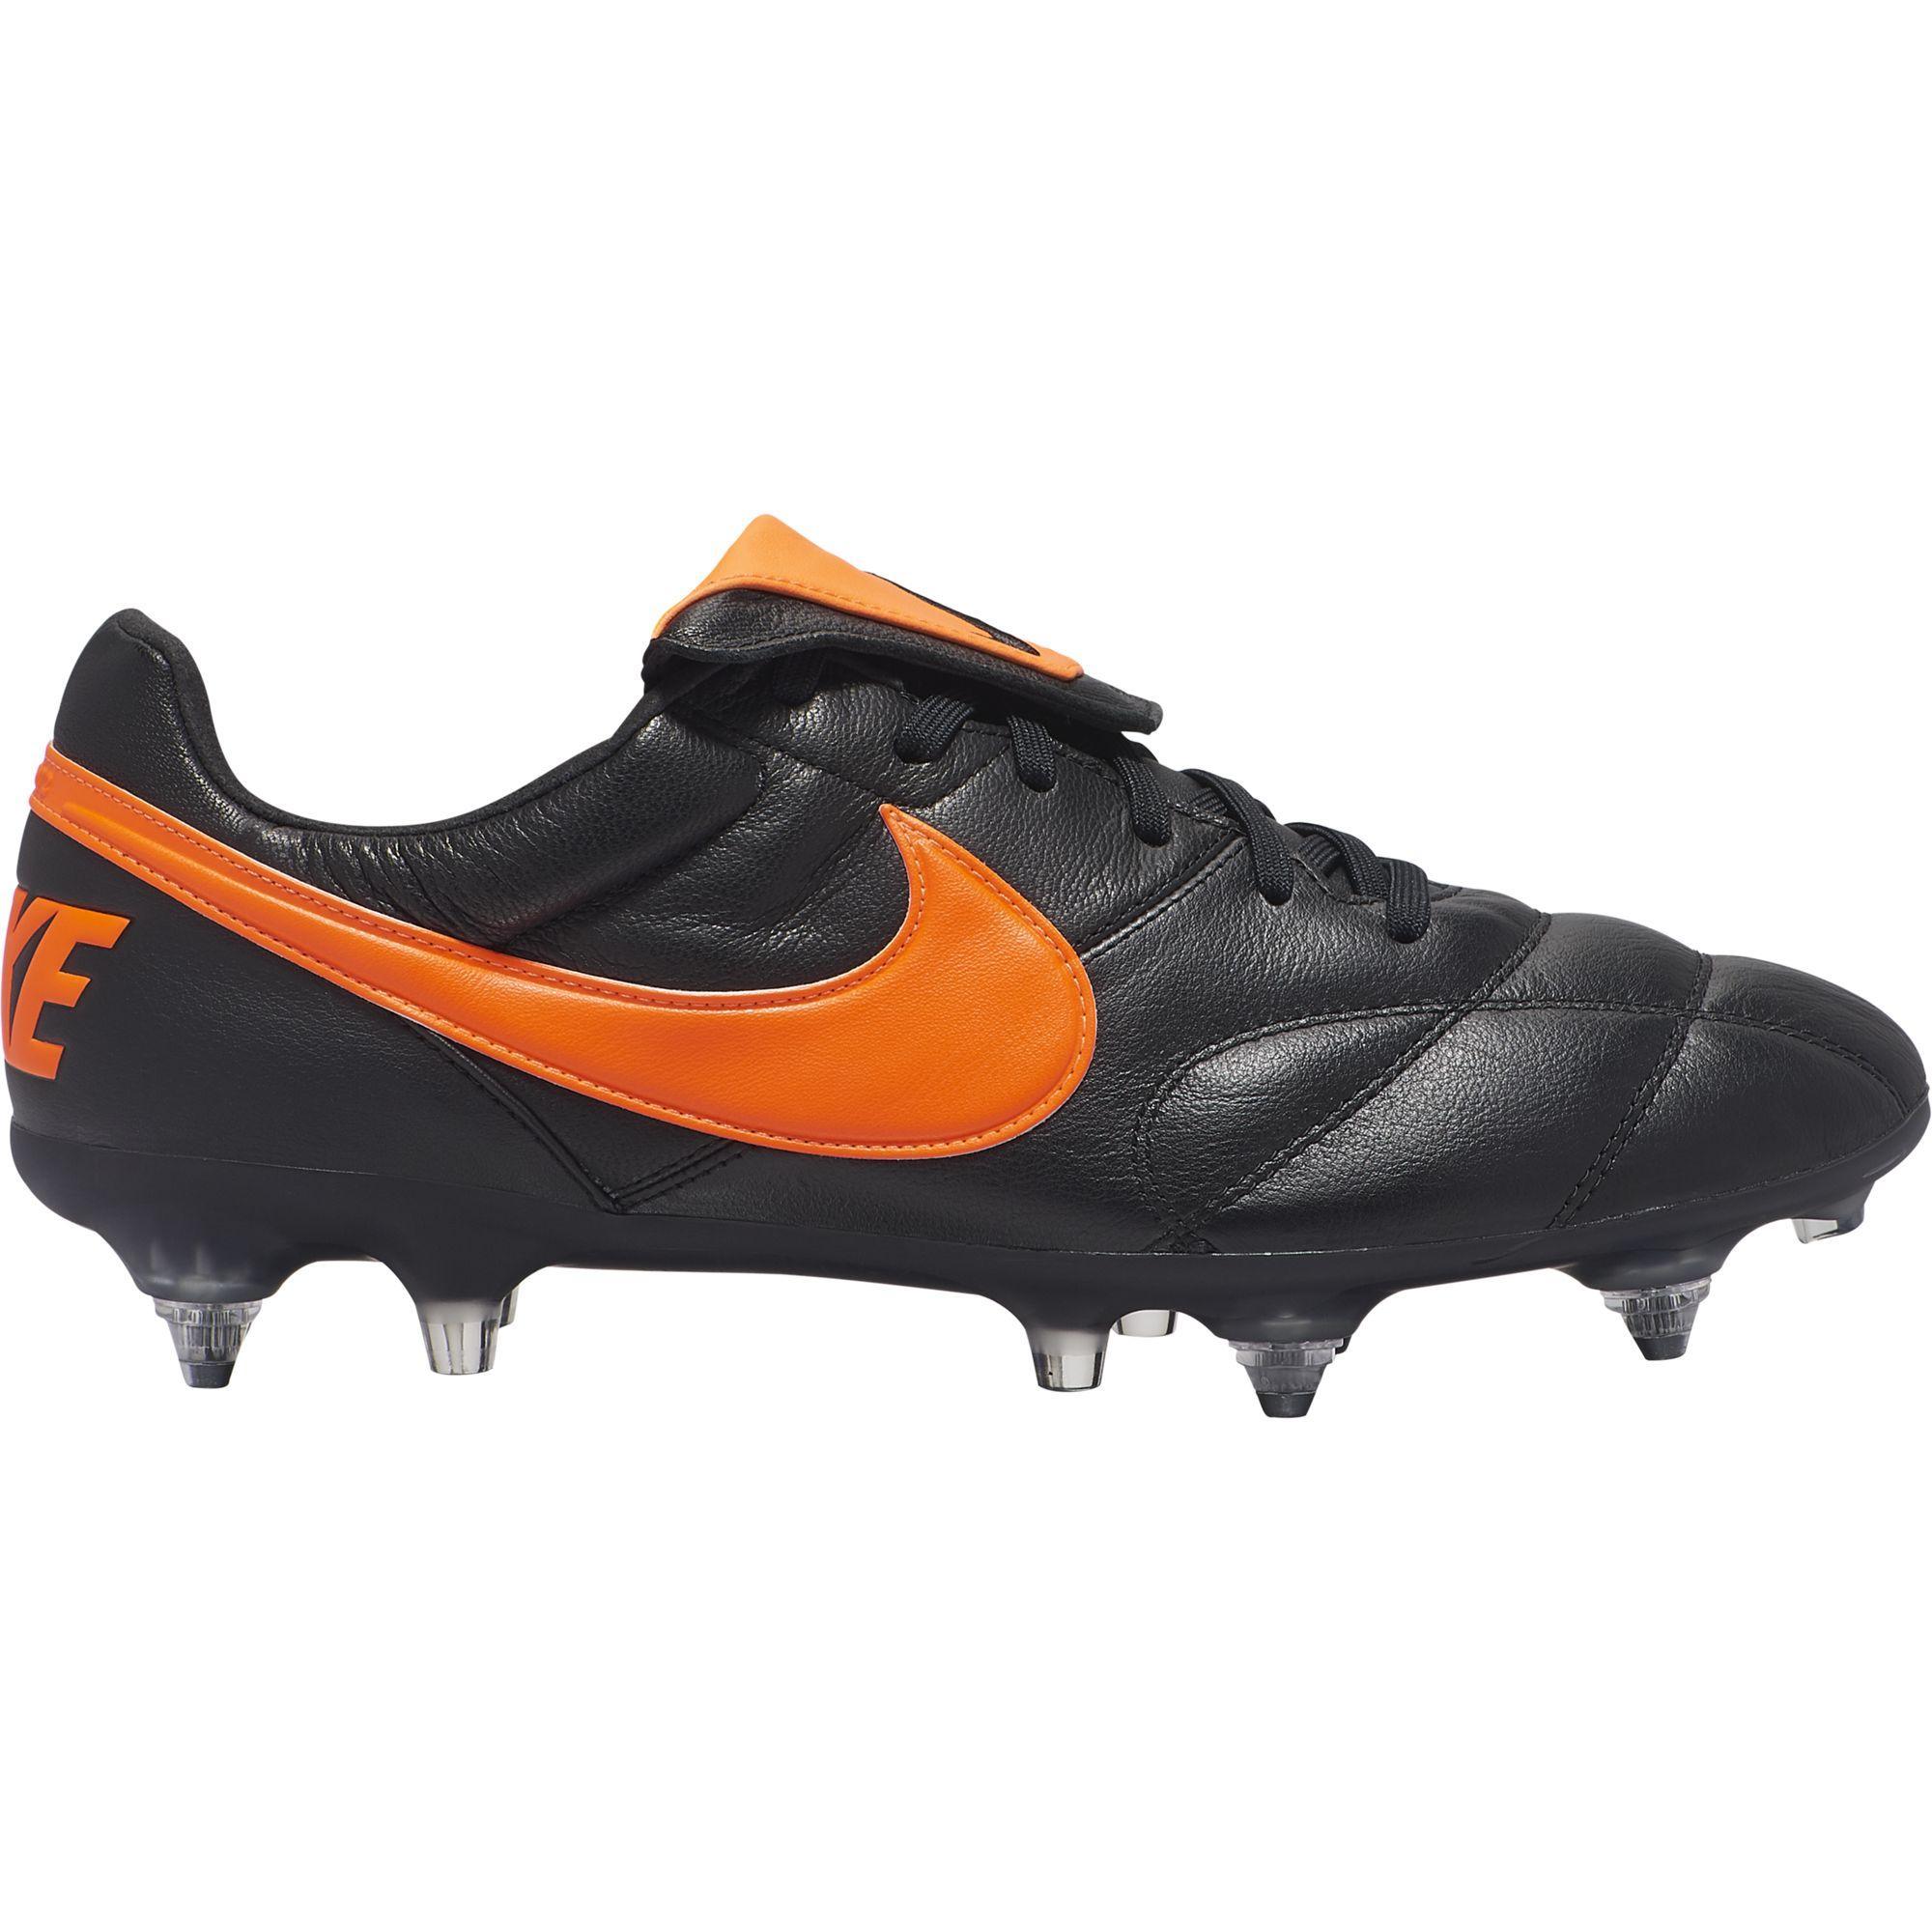 Nike Scarpe Calcio Premier Ii Ac Sg-pro